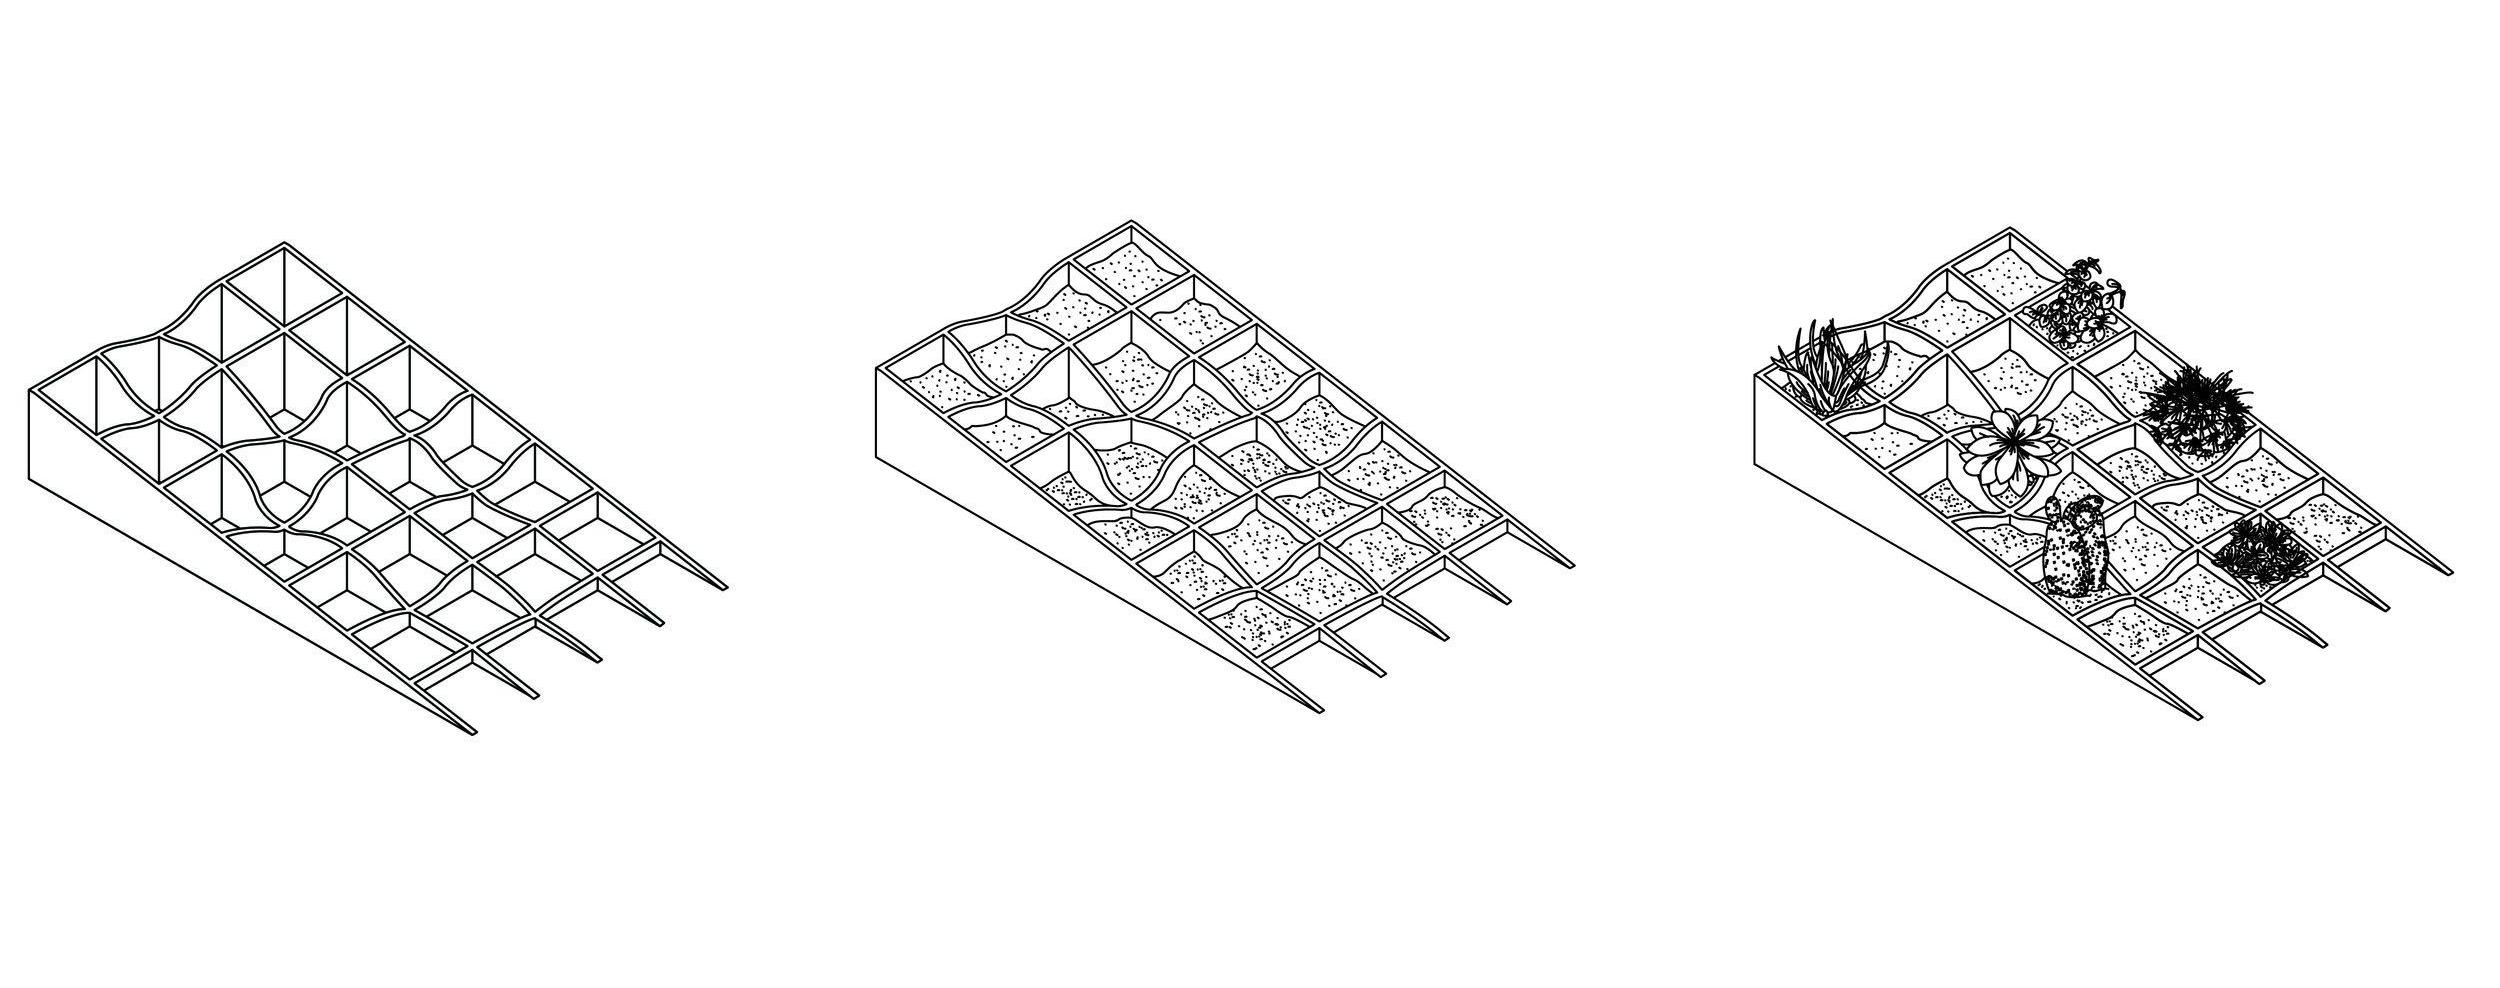 configuration-topo planters.jpg